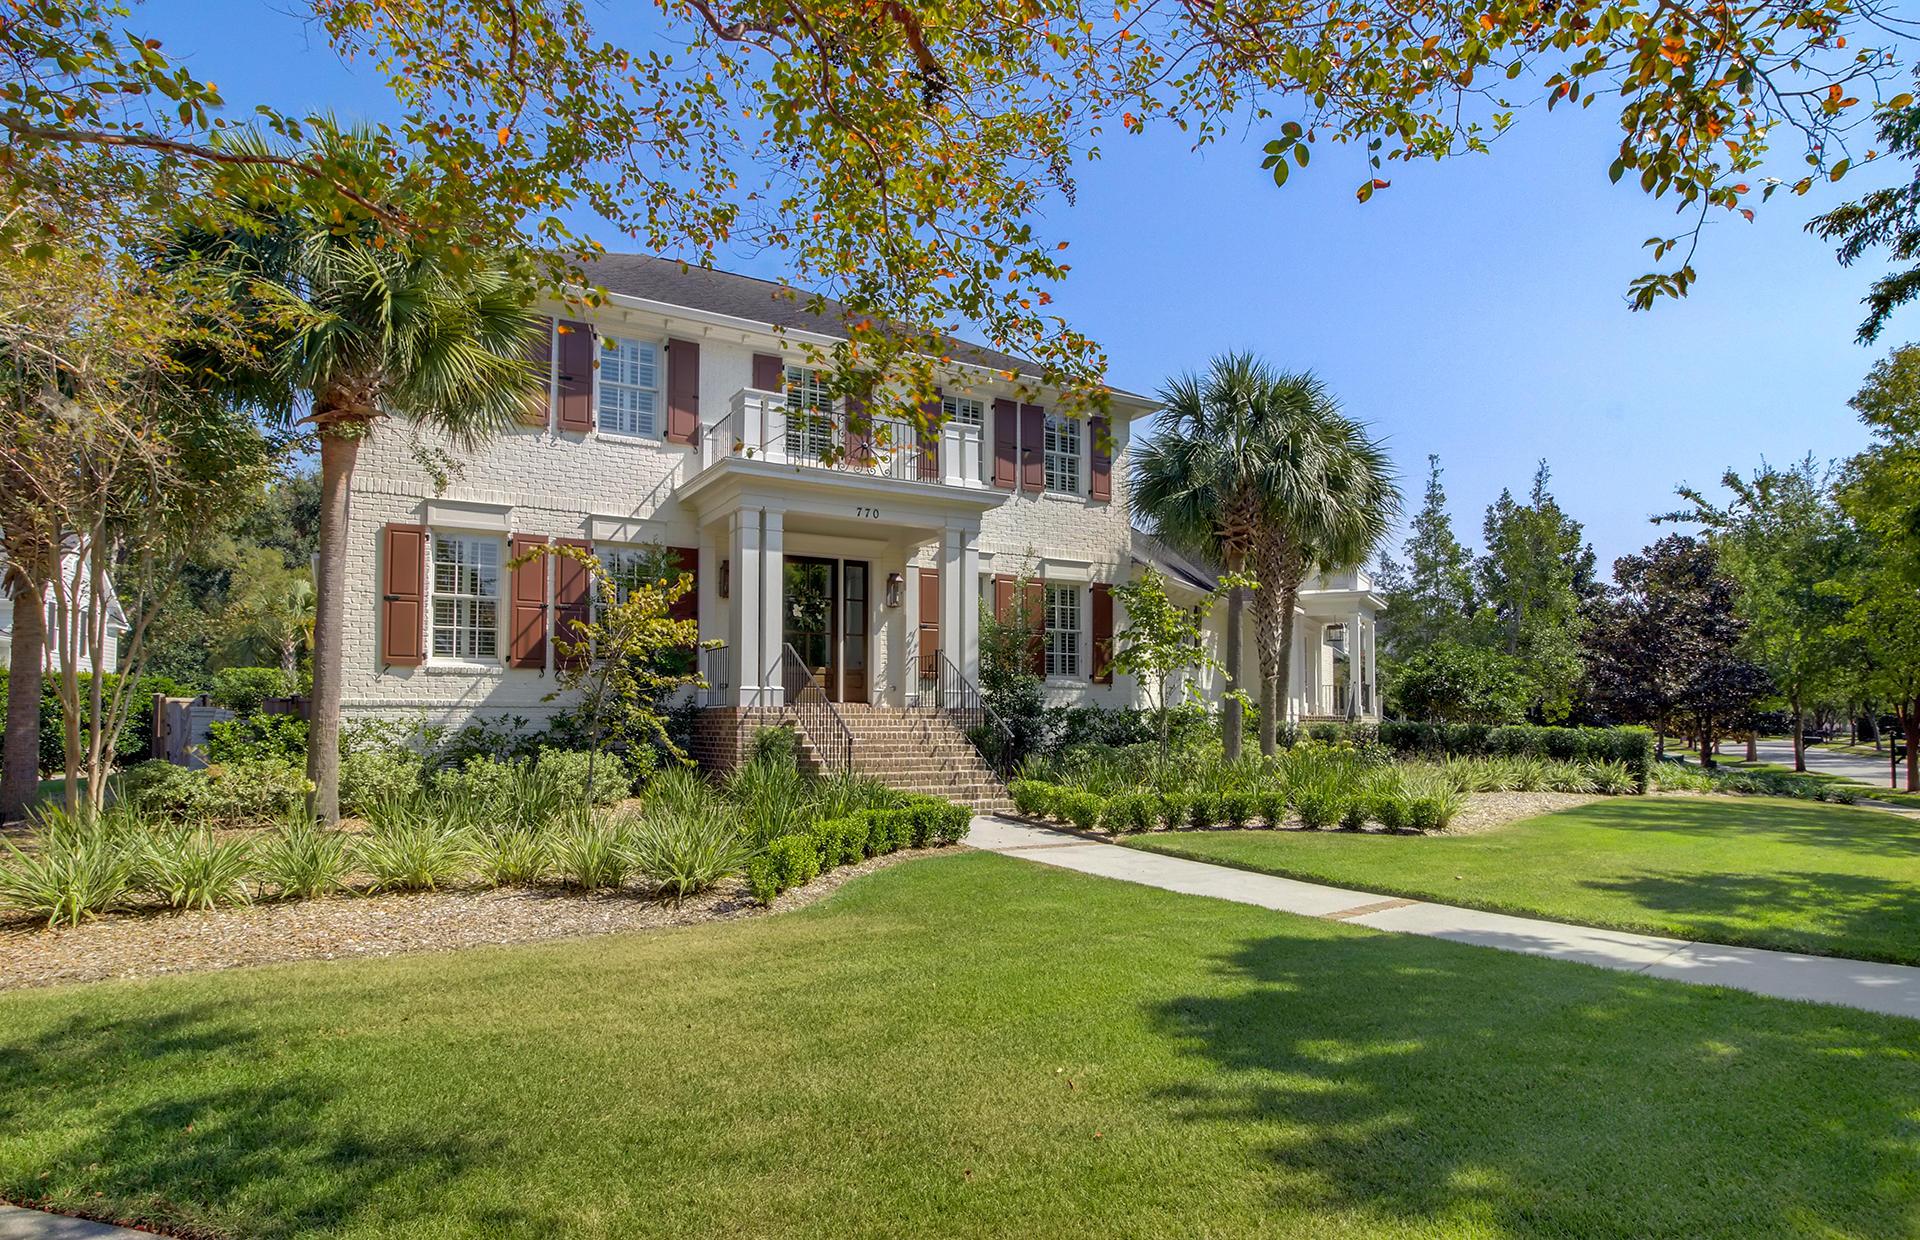 Olde Park Homes For Sale - 770 Olde Central, Mount Pleasant, SC - 78